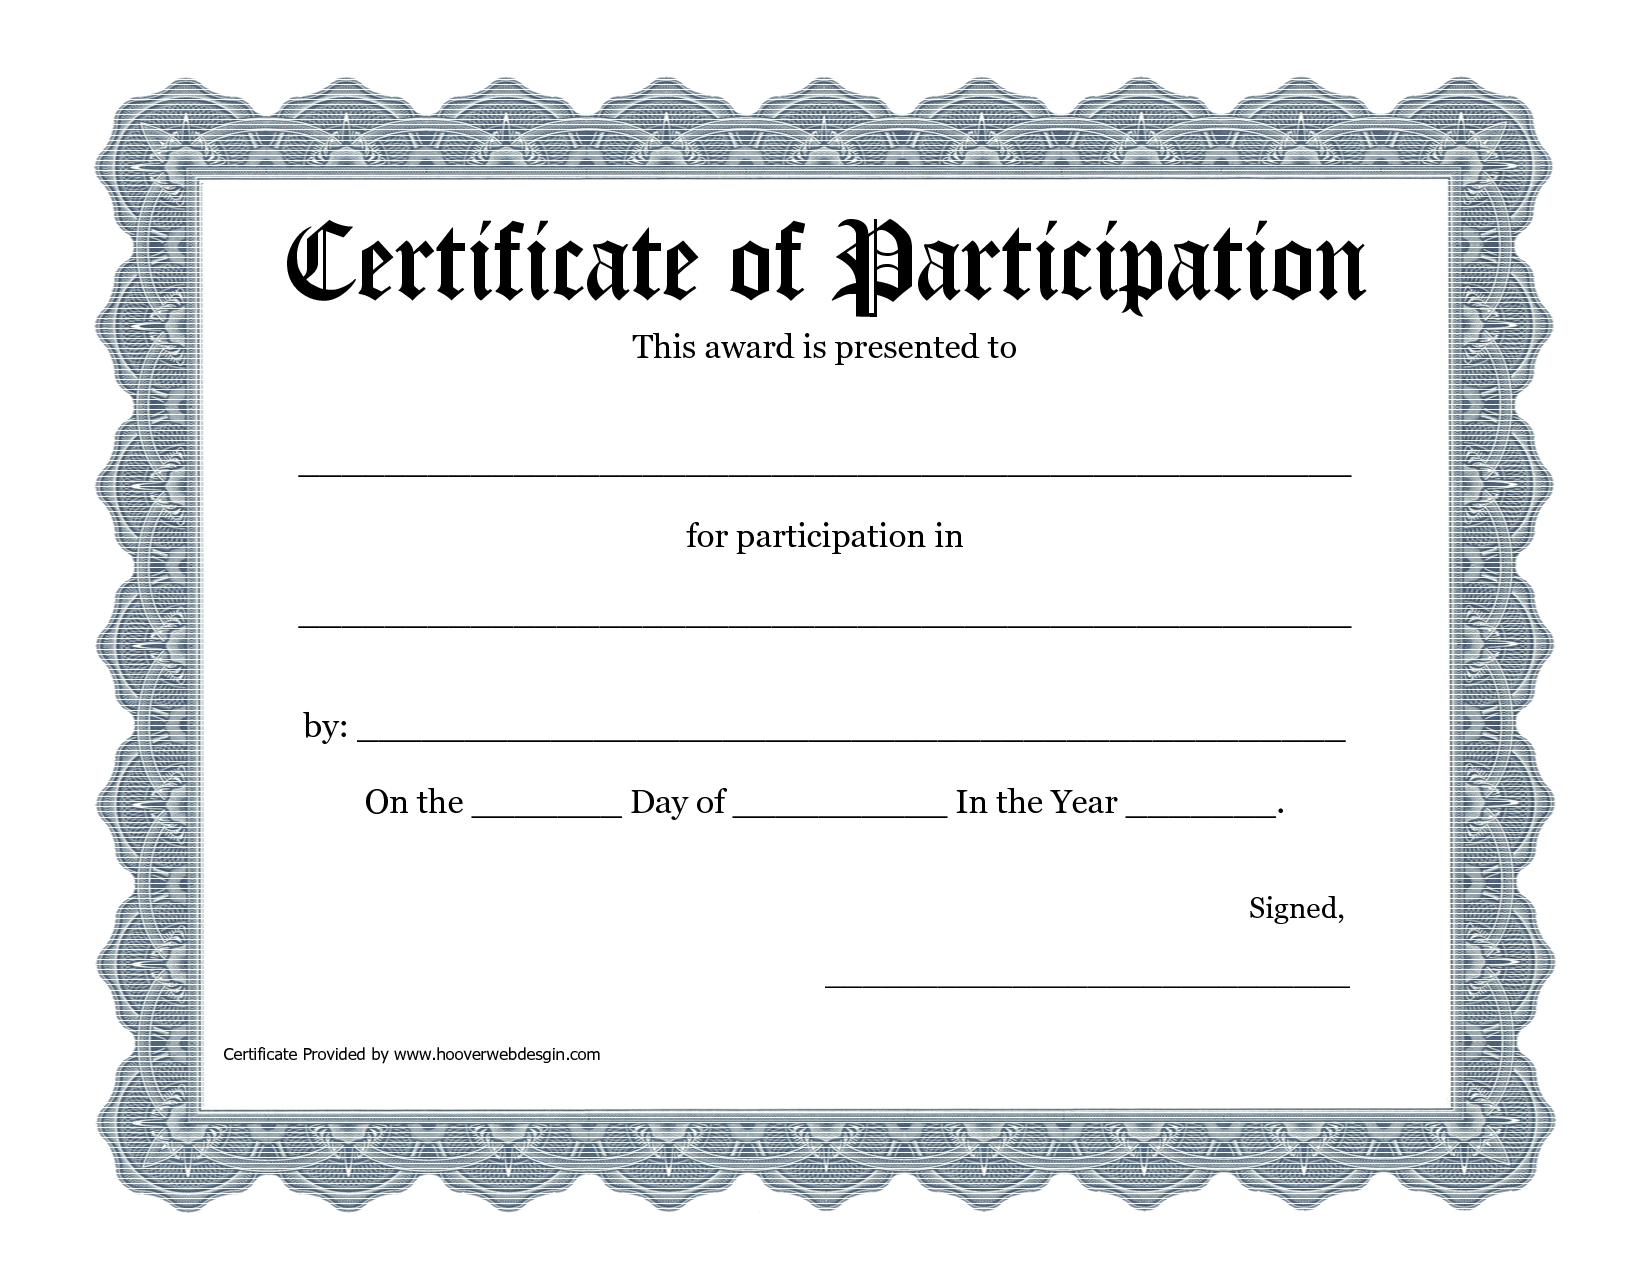 Free Printable Award Certificate Template - Bing Images | 2016 Art - Free Printable Certificates For Students